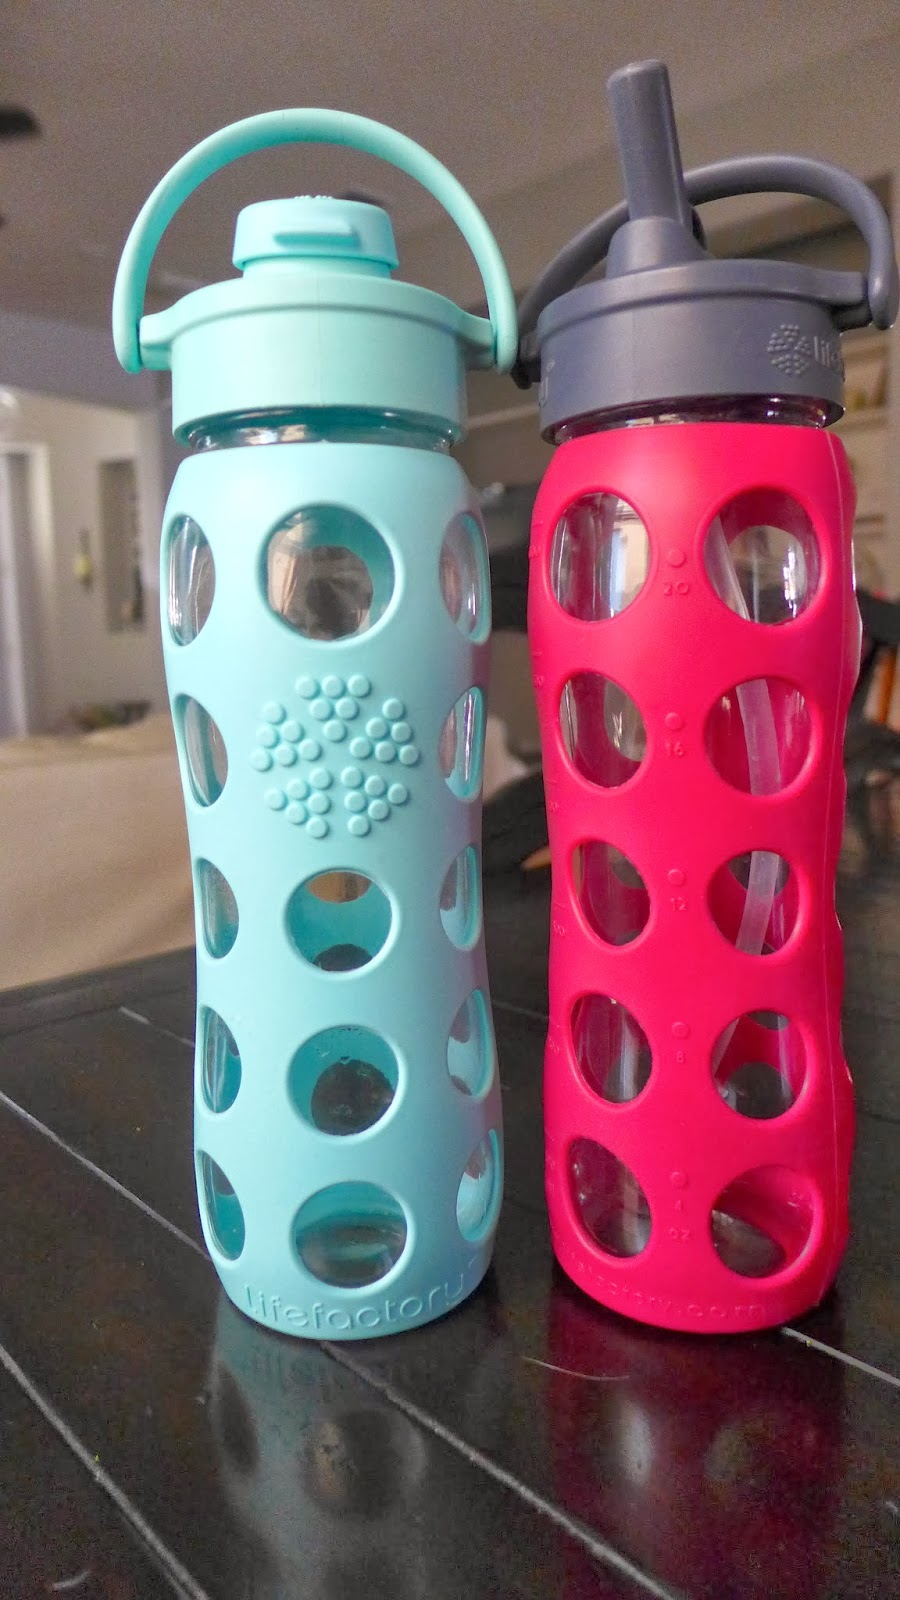 LifeFactory Water Bottles #water